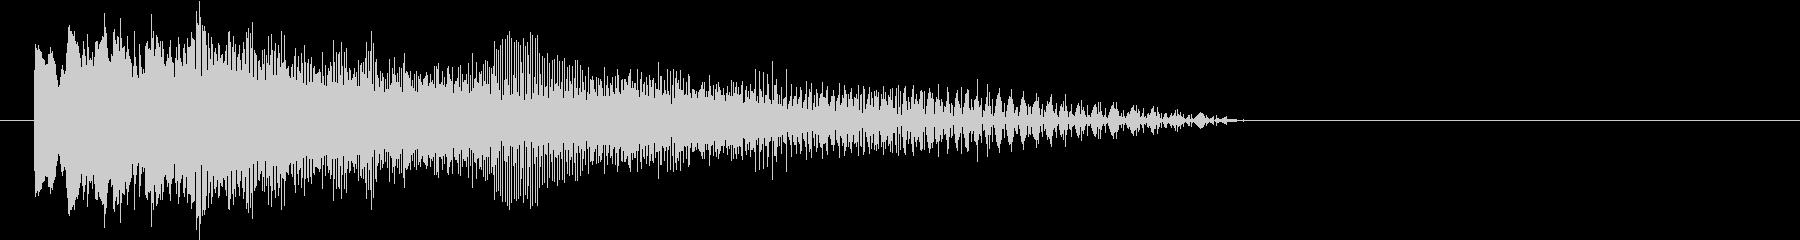 【SF】落下音の未再生の波形